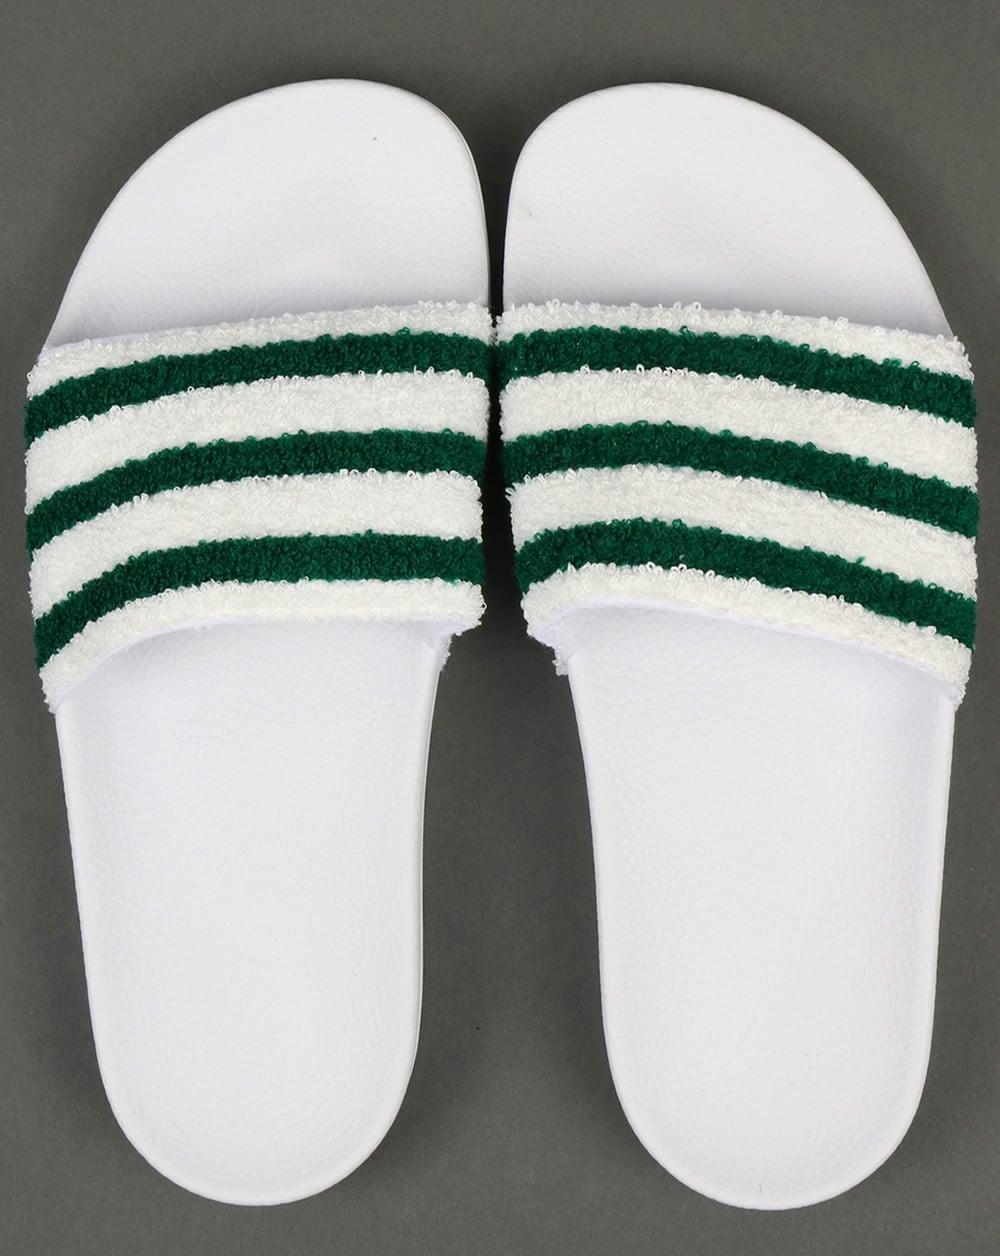 4c5ffdb8dc39 Adidas Premium Towelling Sliders White Green